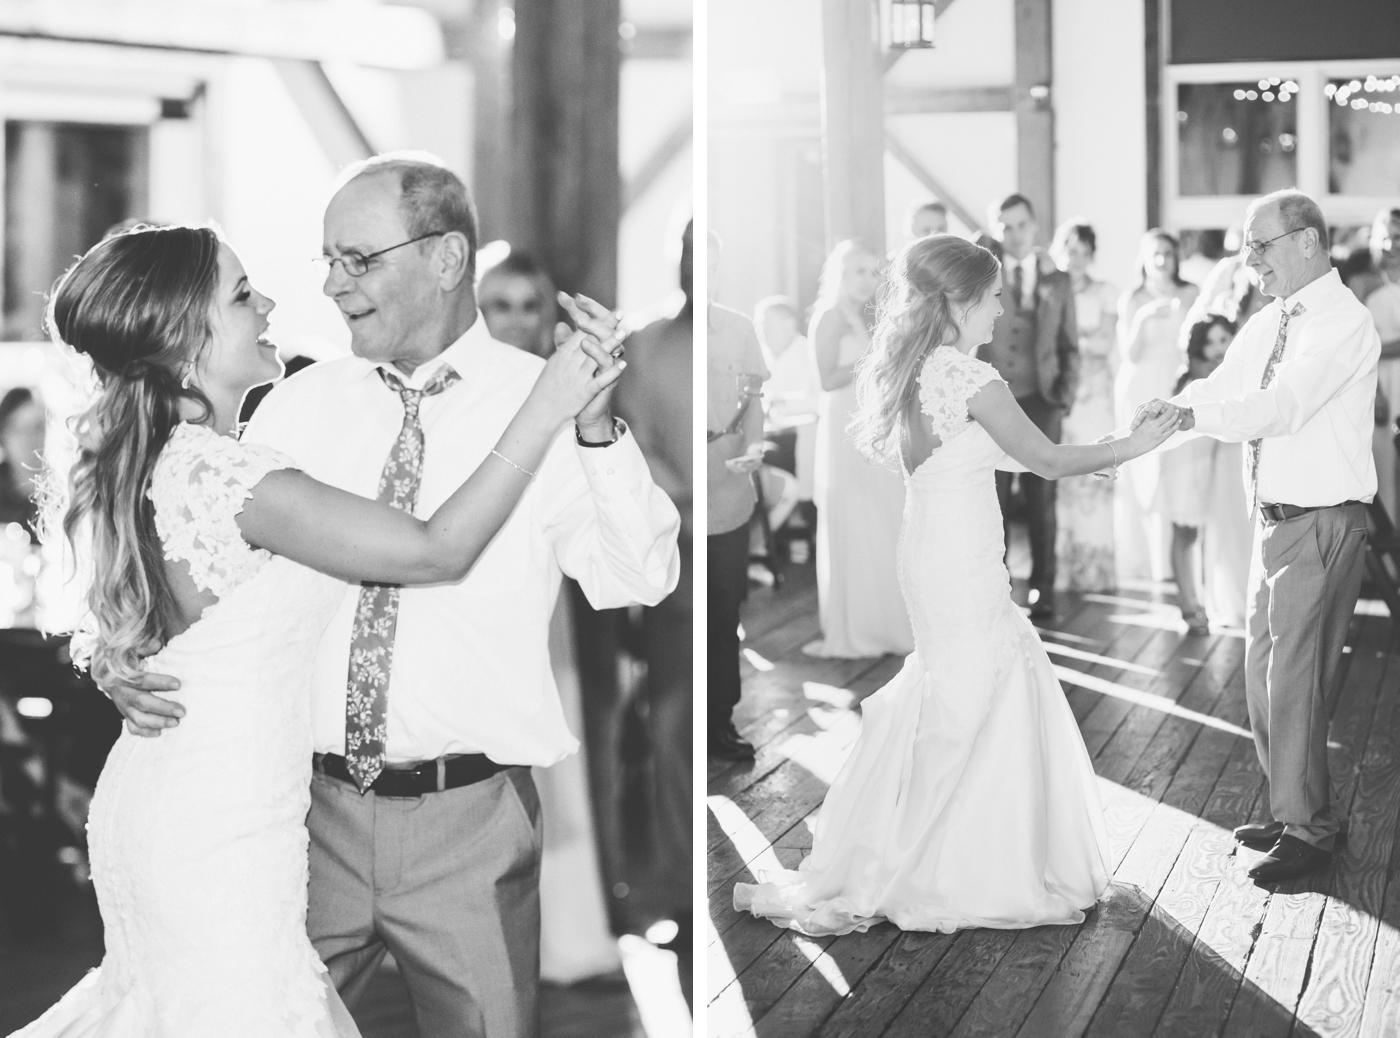 chicago-fine-art-wedding-photography-chiapetta46